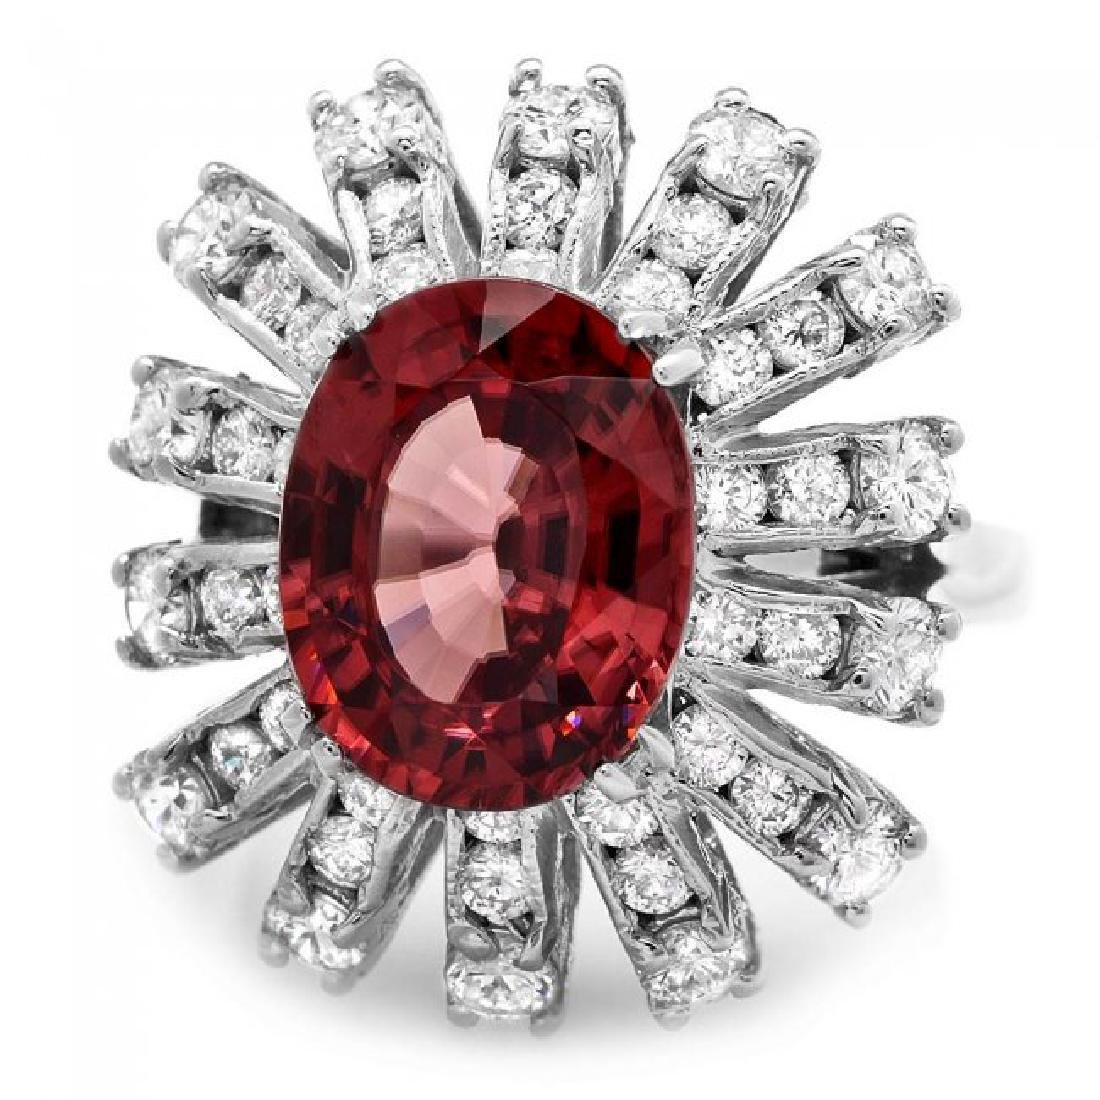 14k White Gold 5.65ct Zircon 1.80ct Diamond Ring - 2